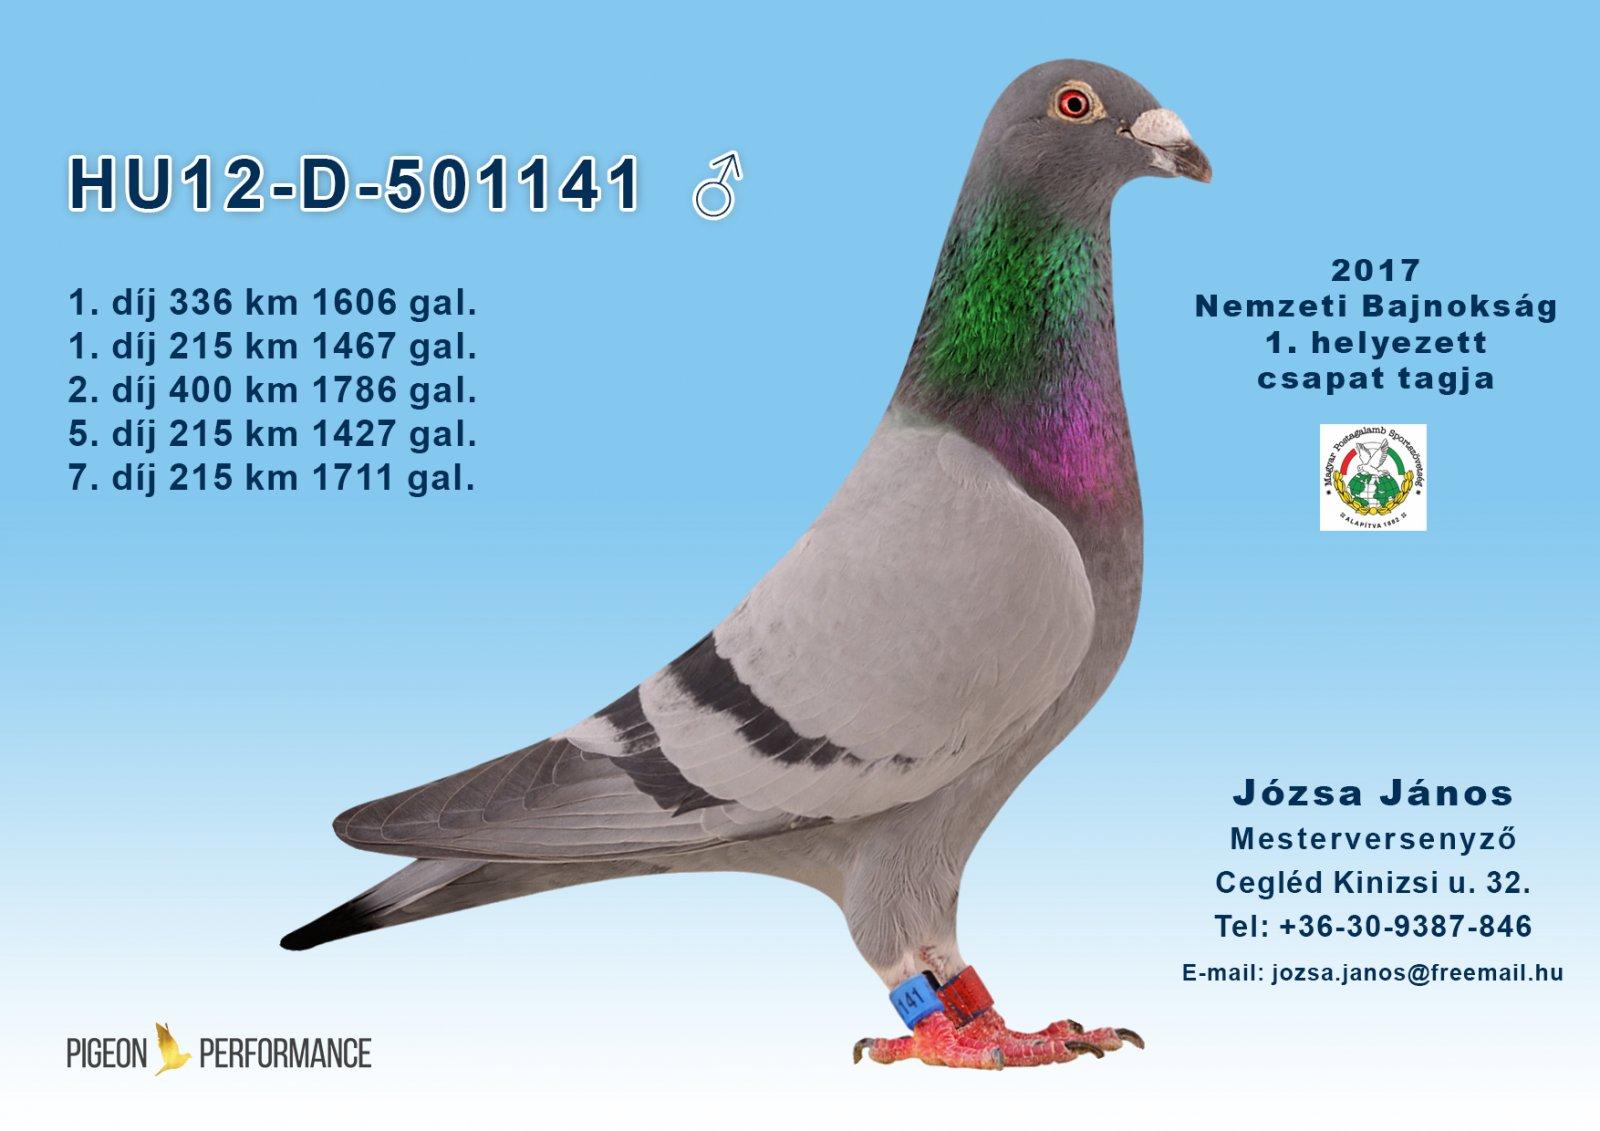 HU-2012-D-501141